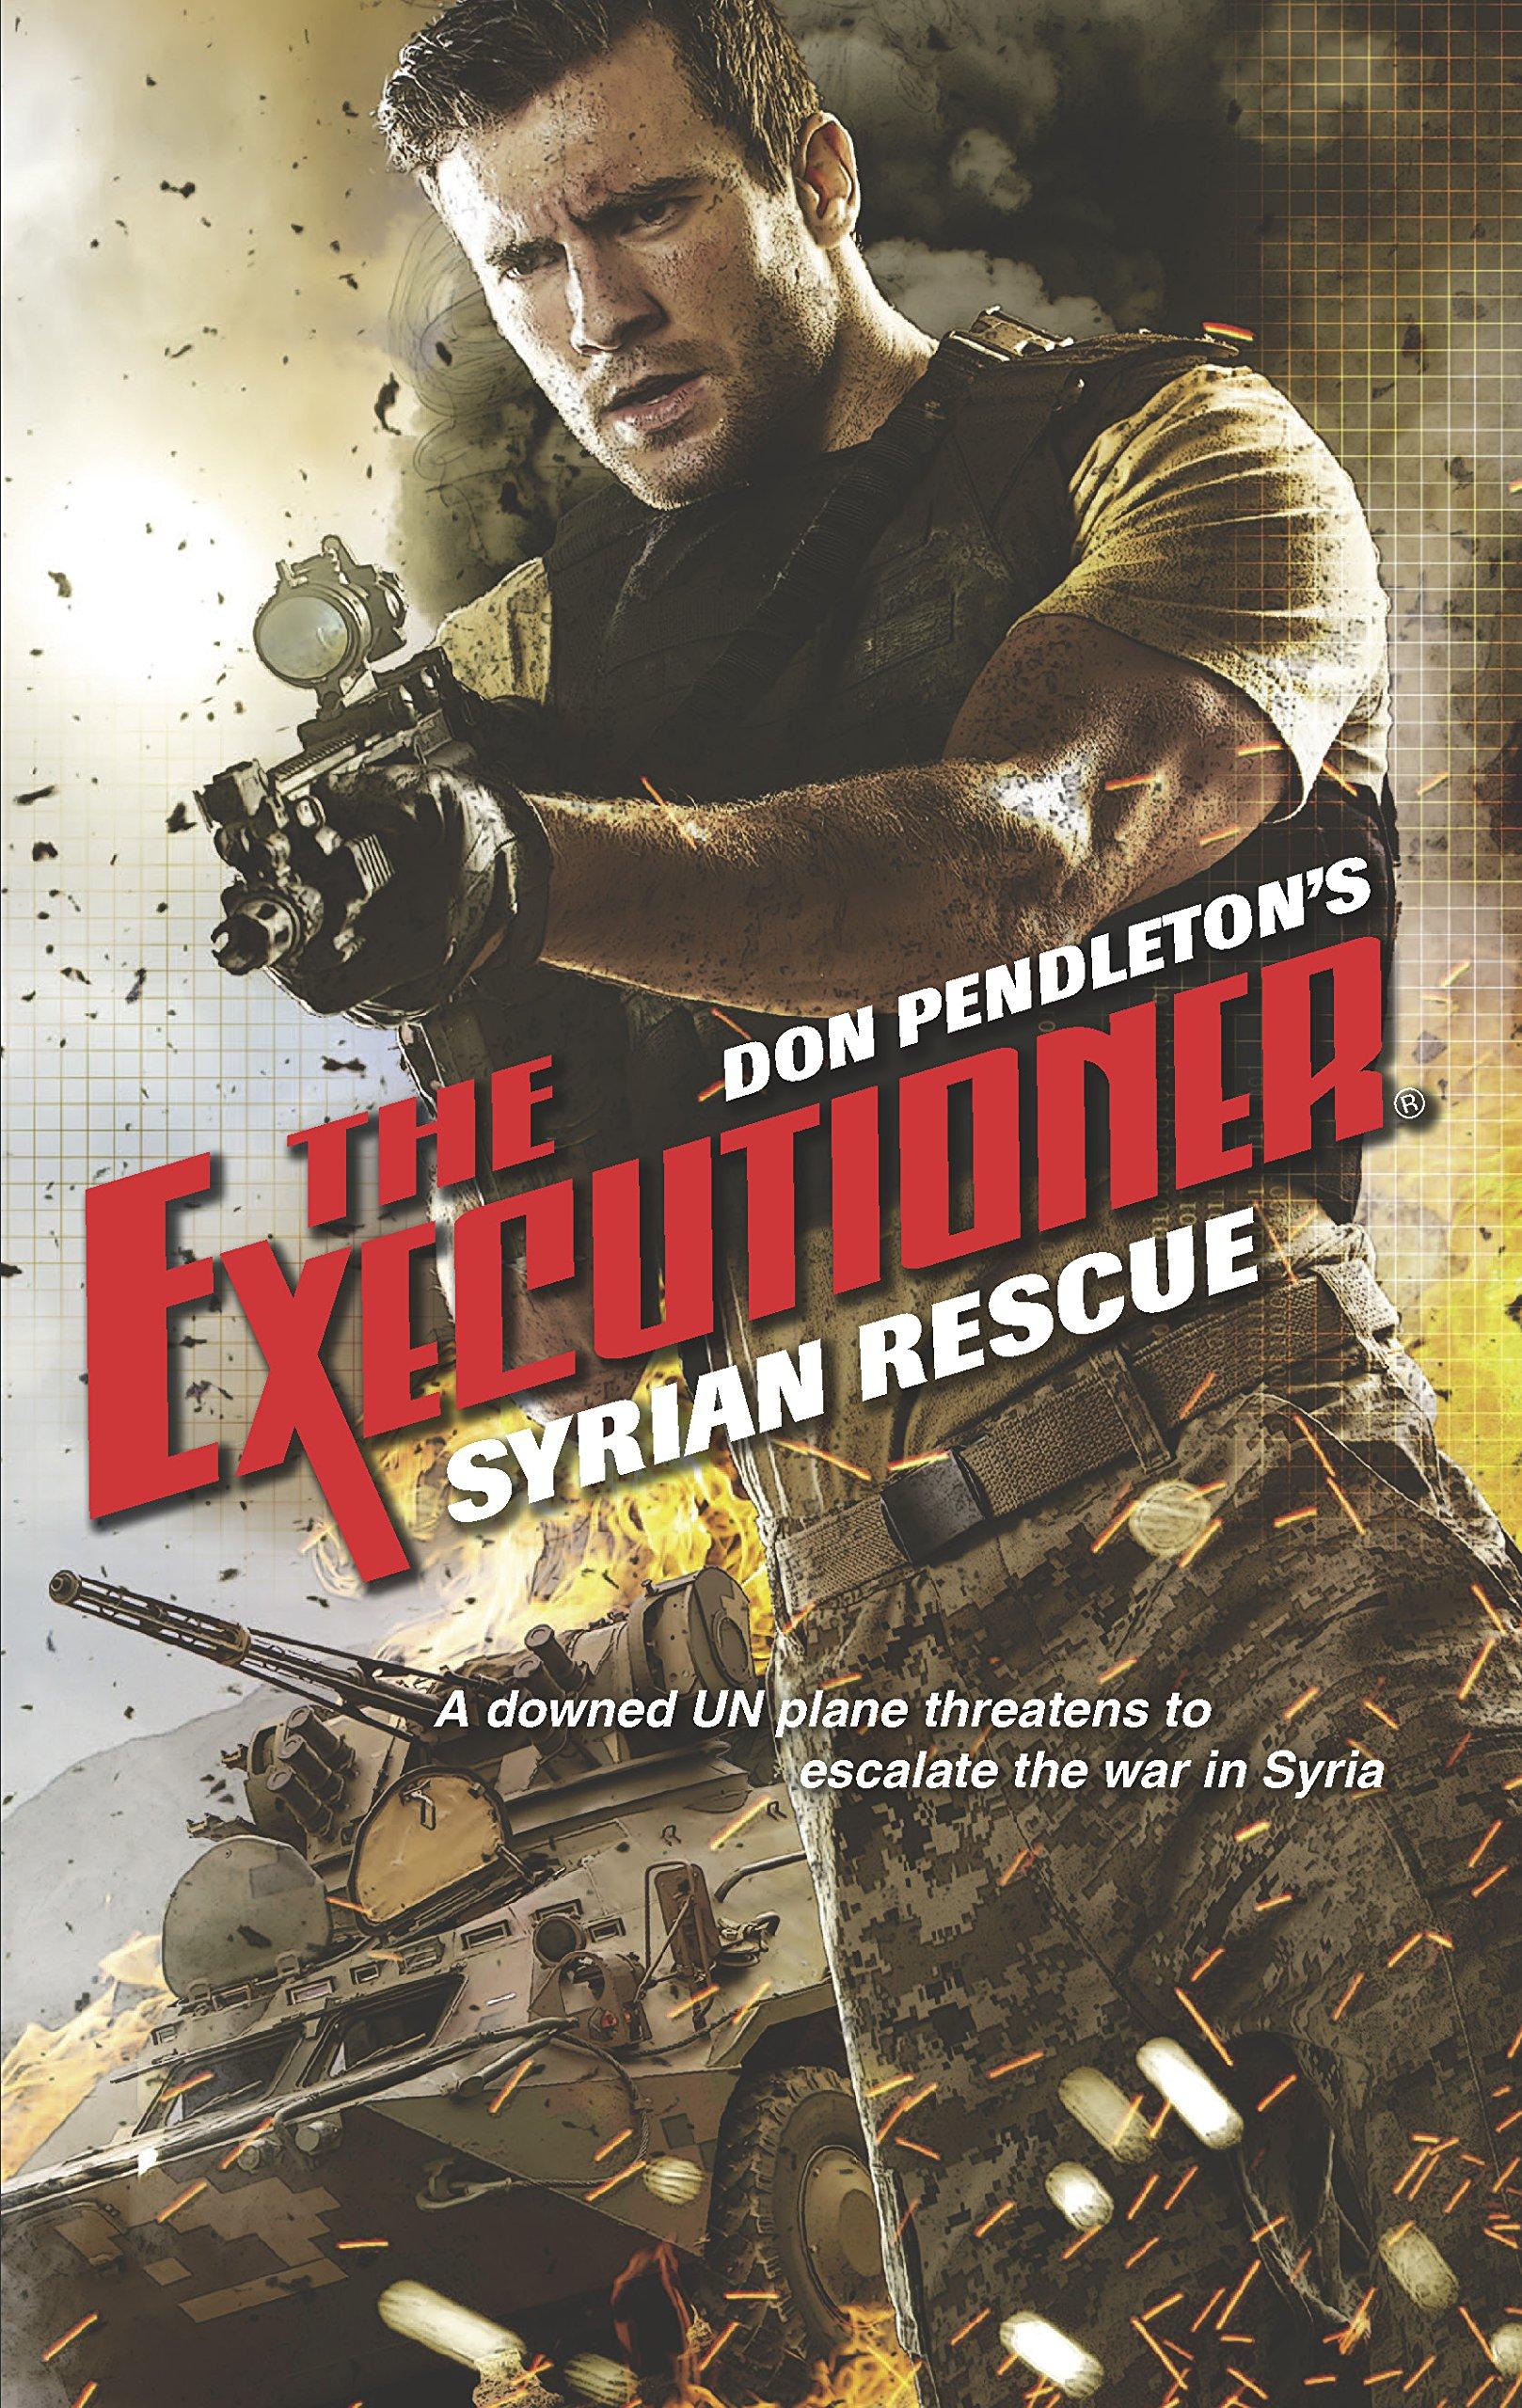 Amazon.com: Syrian Rescue (Executioner) (9780373644421): Don Pendleton:  Books